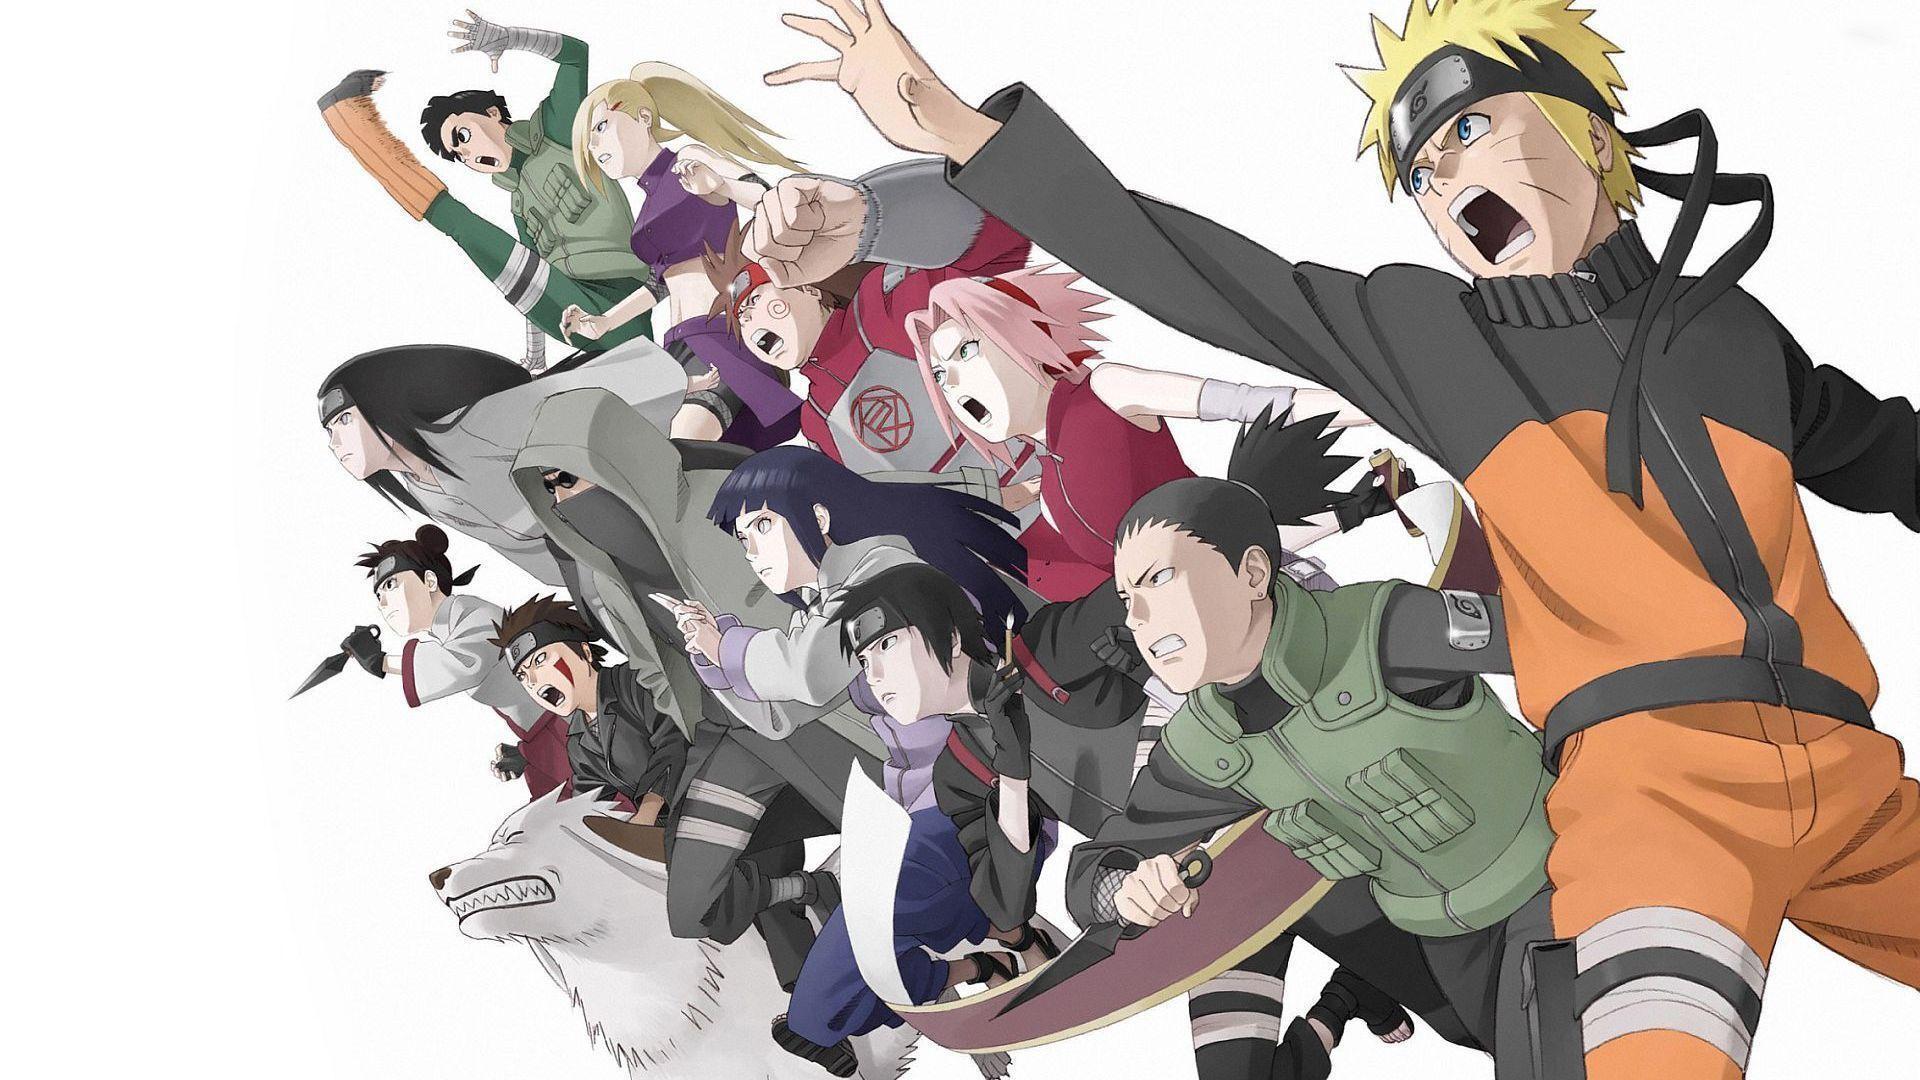 Naruto And Friends Wallpapers Top Free Naruto And Friends Backgrounds Wallpaperaccess